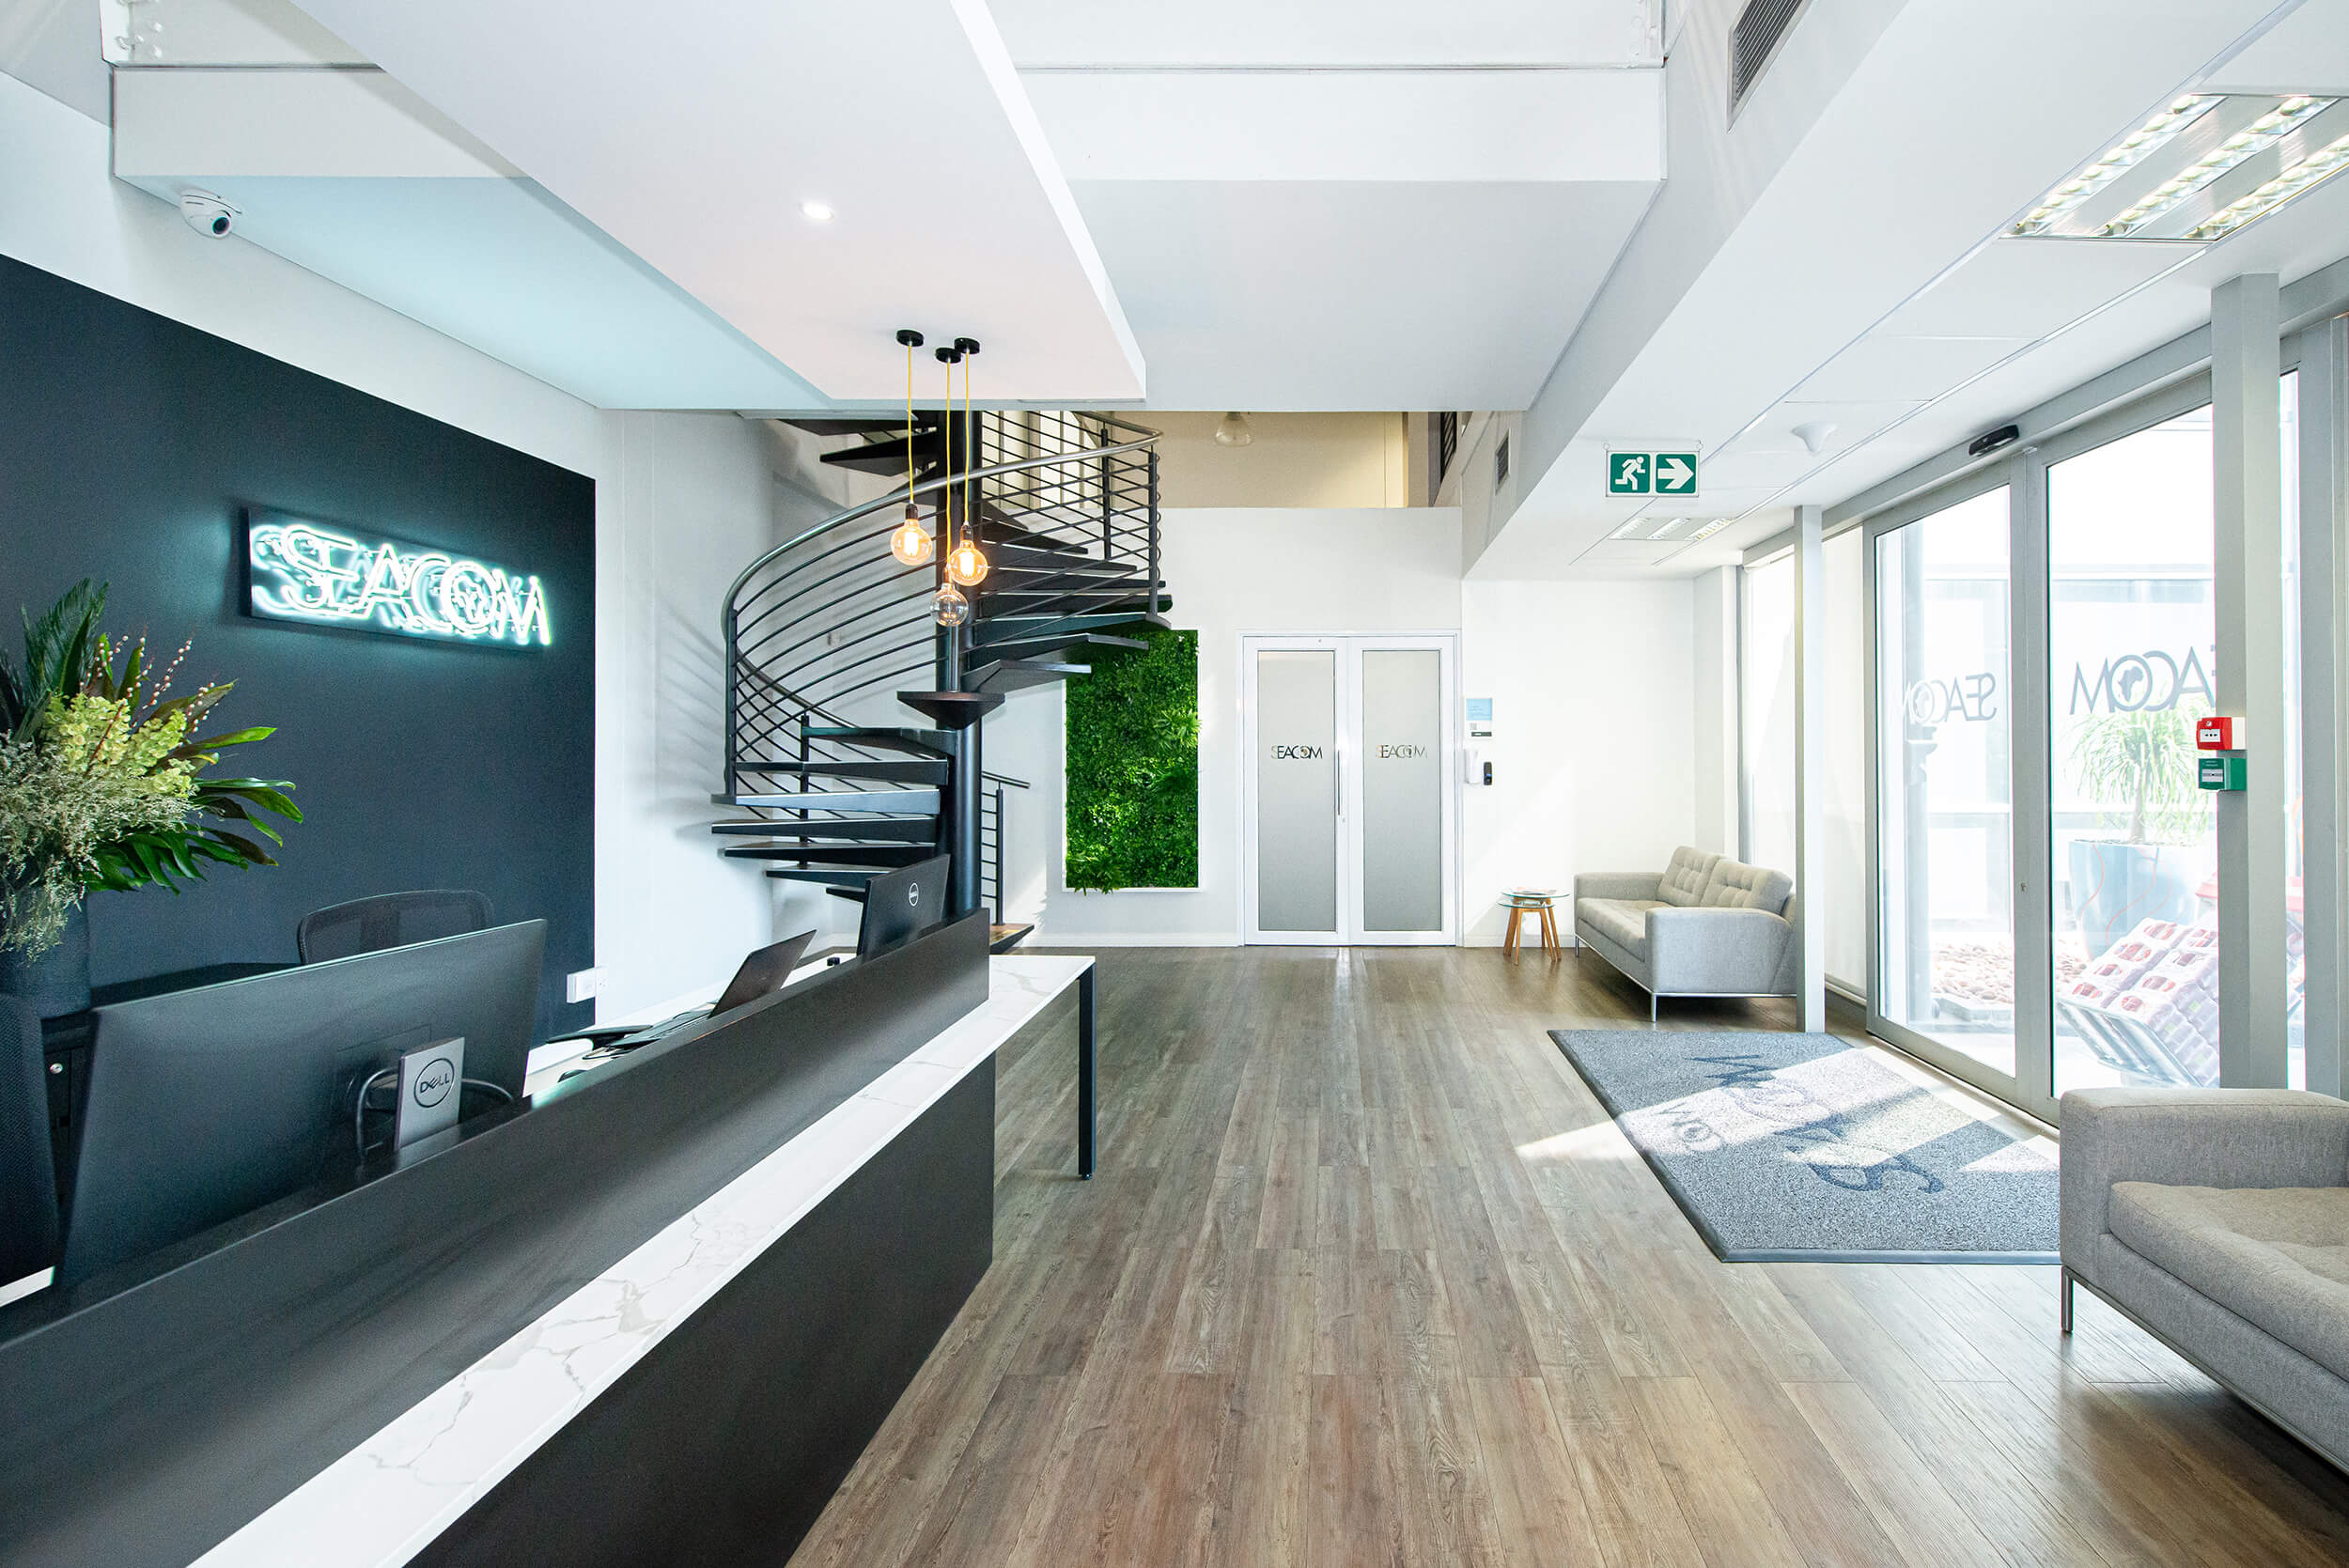 Seacom - Turnkey Interiors - Corporate Interior Design and Build